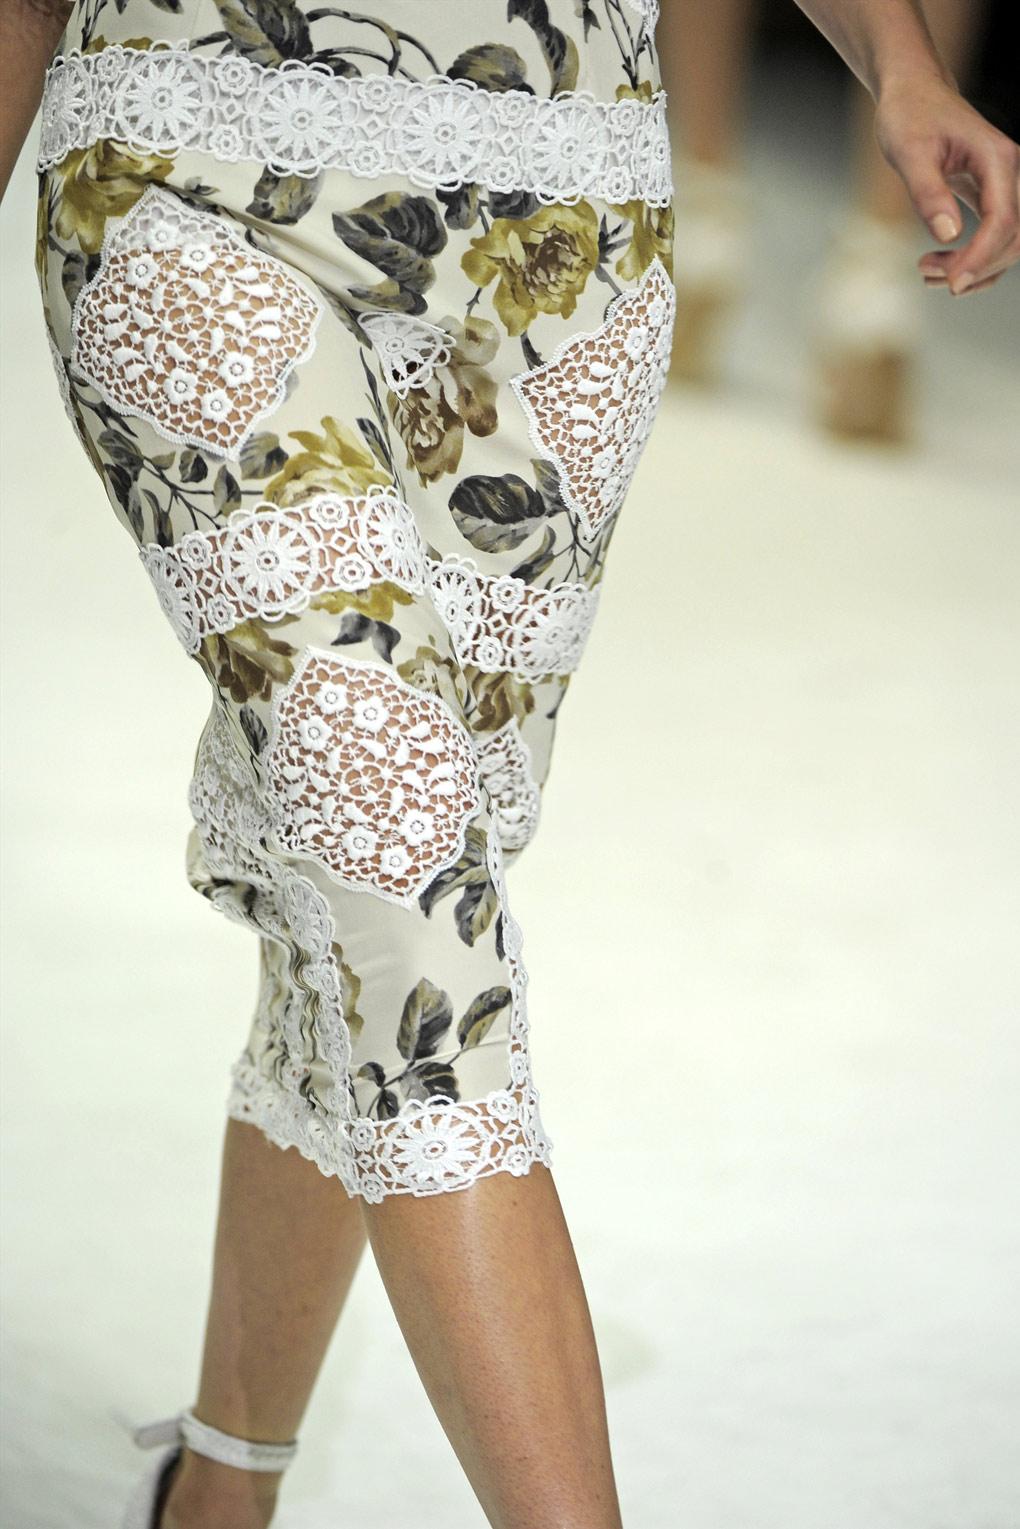 Dolce & Gabbana Spring Summer 2011 Ready to Wear